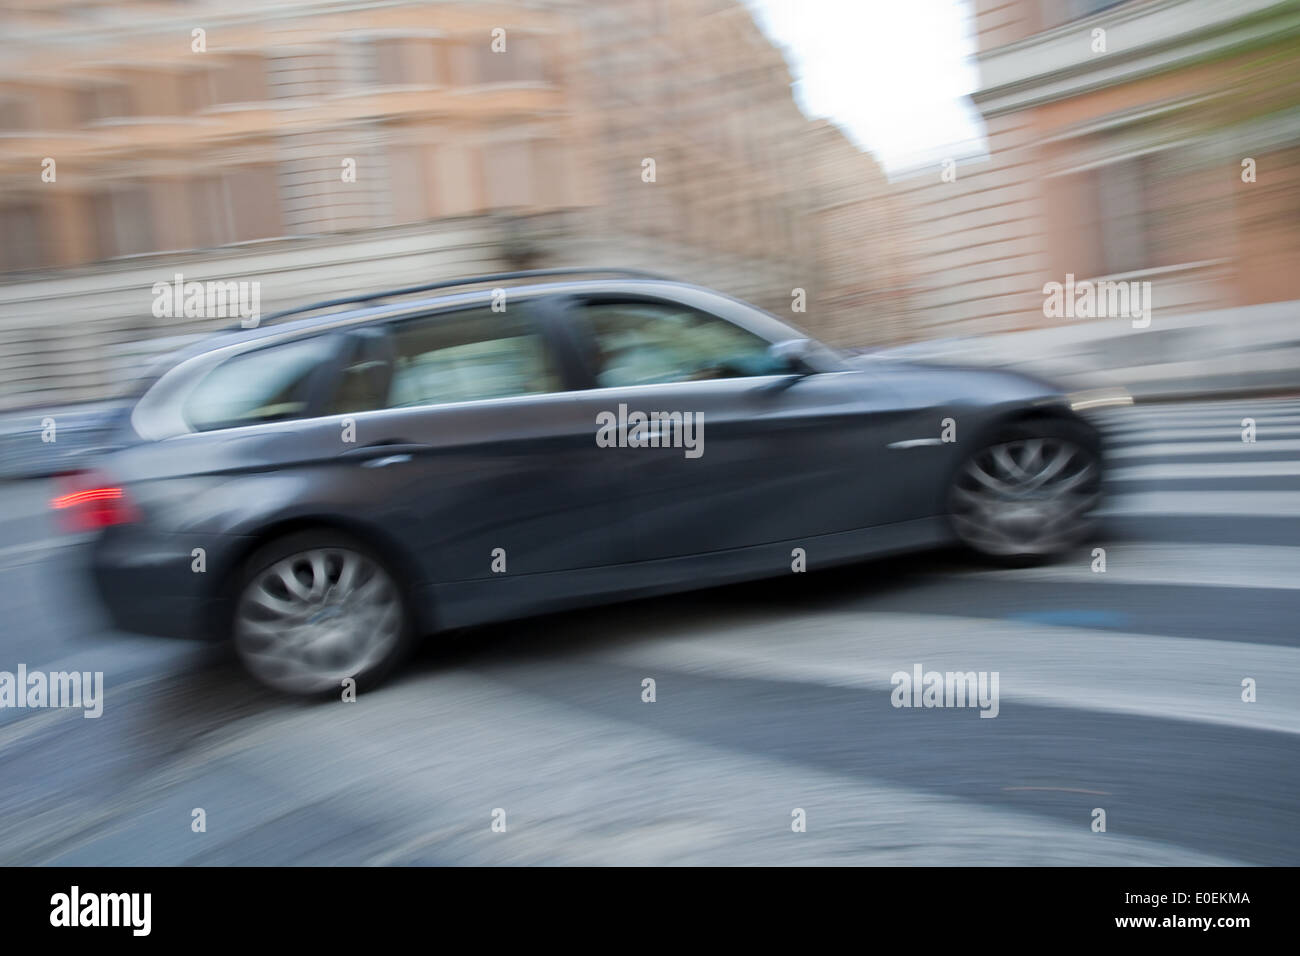 Schnell fahrendes Auto - Speeding car - Stock Image